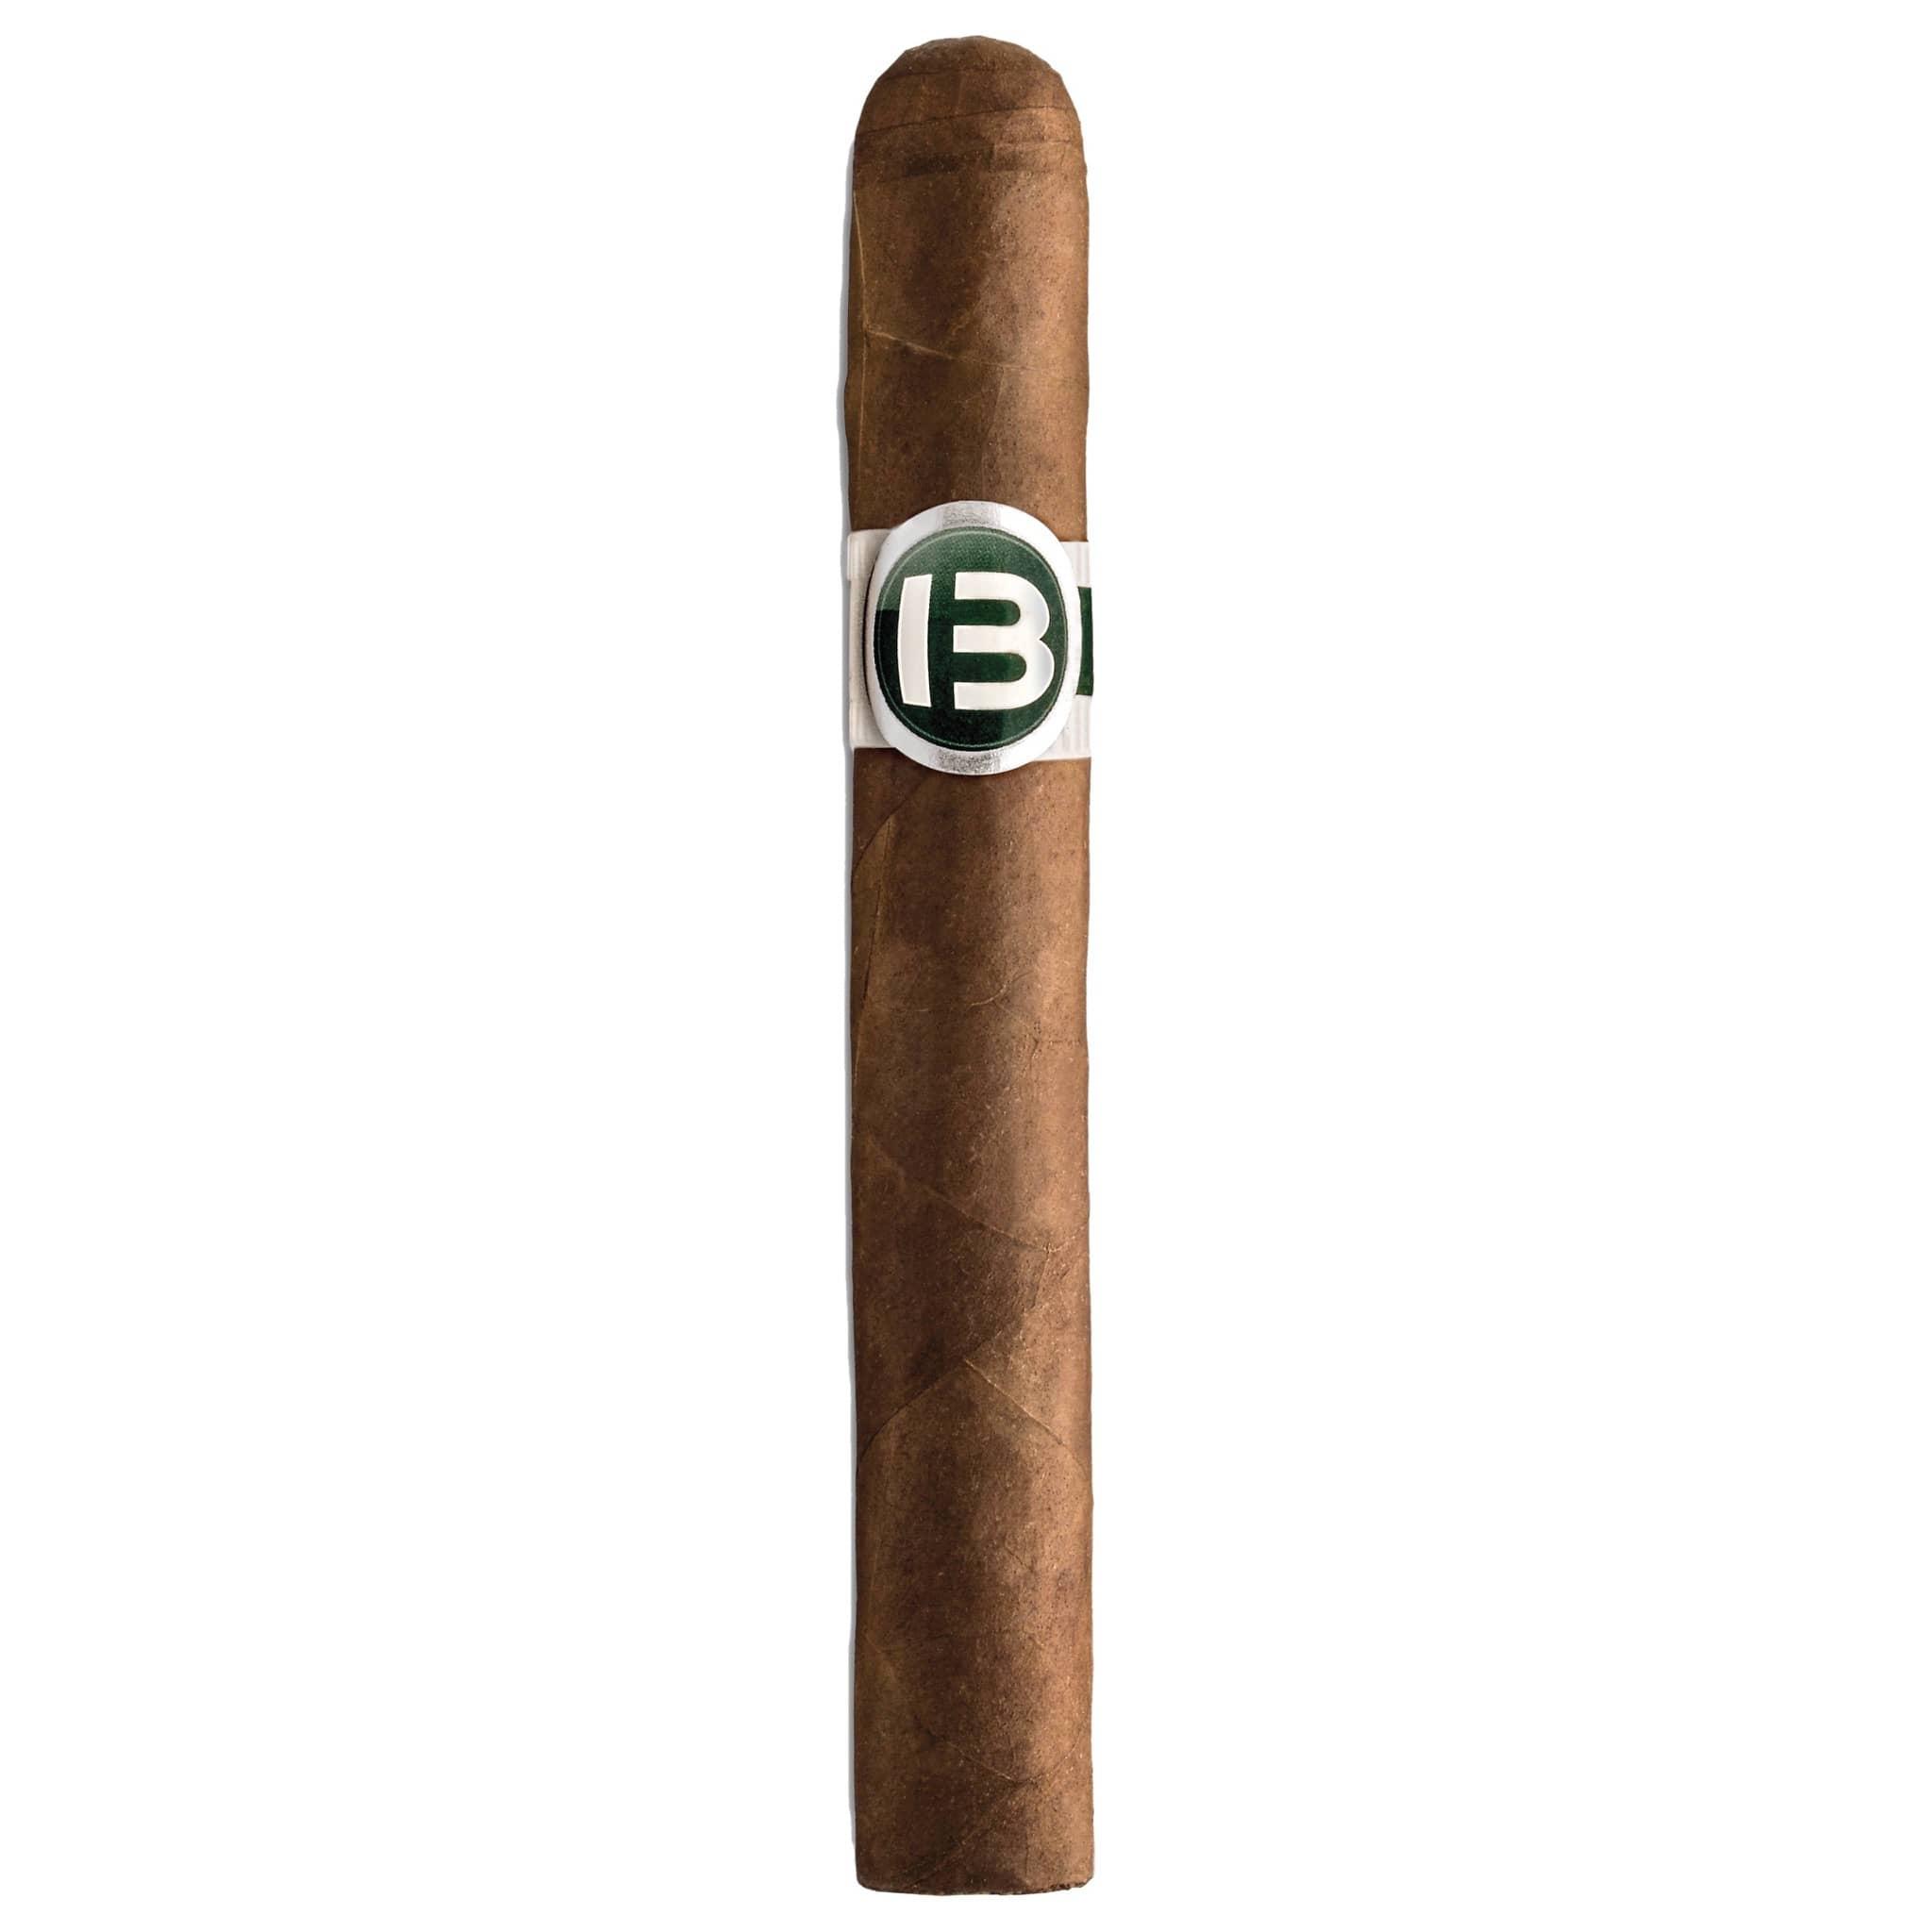 Bentley B13 Cigar